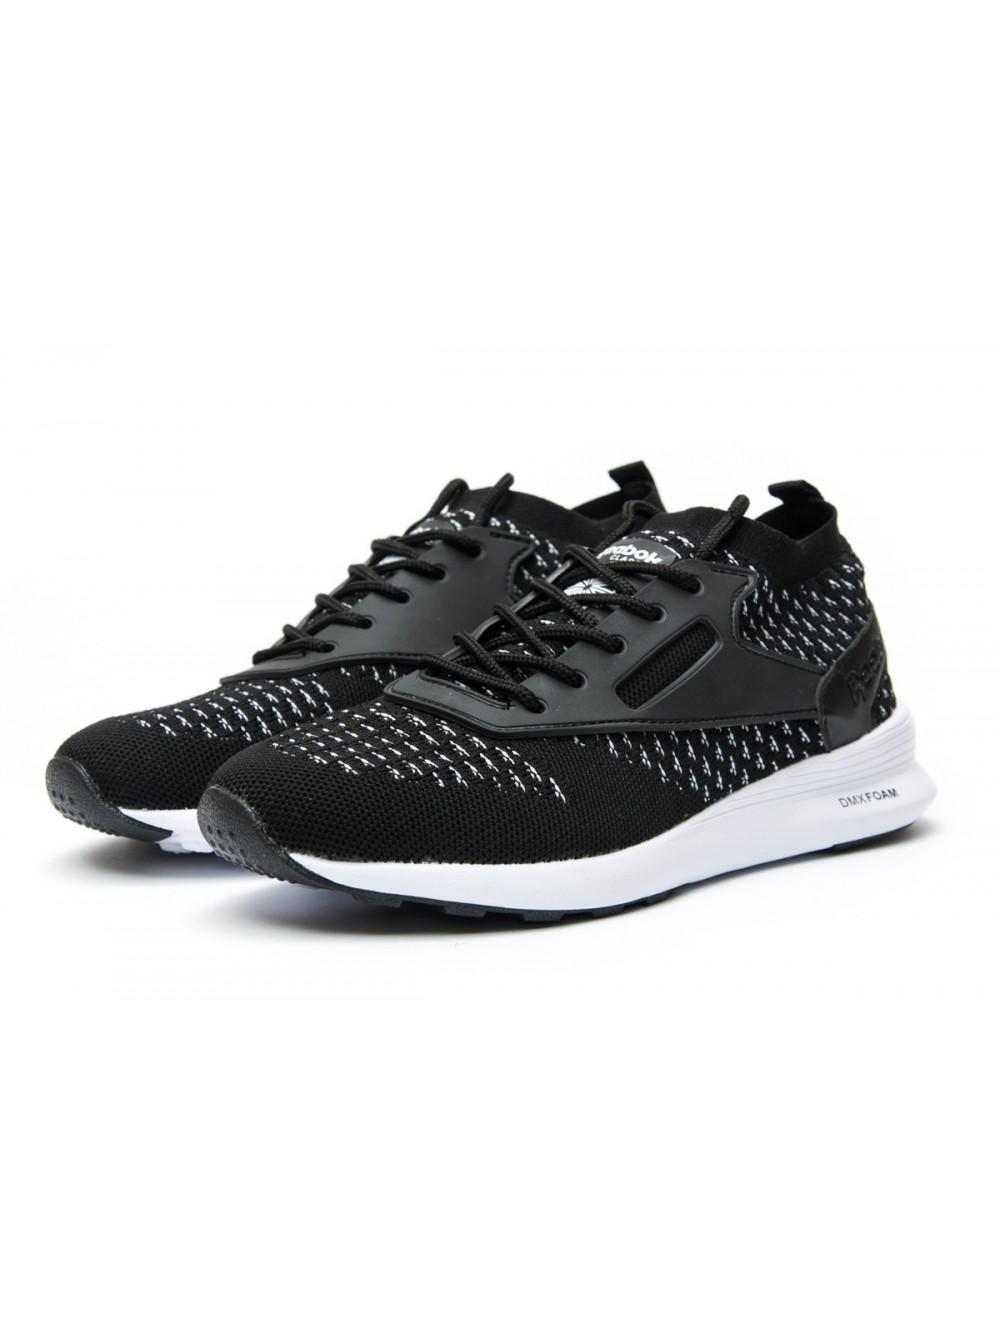 7bb6f59d Купить кроссовки Reebok Zoku Runner женские беговые | KED.NET.UA